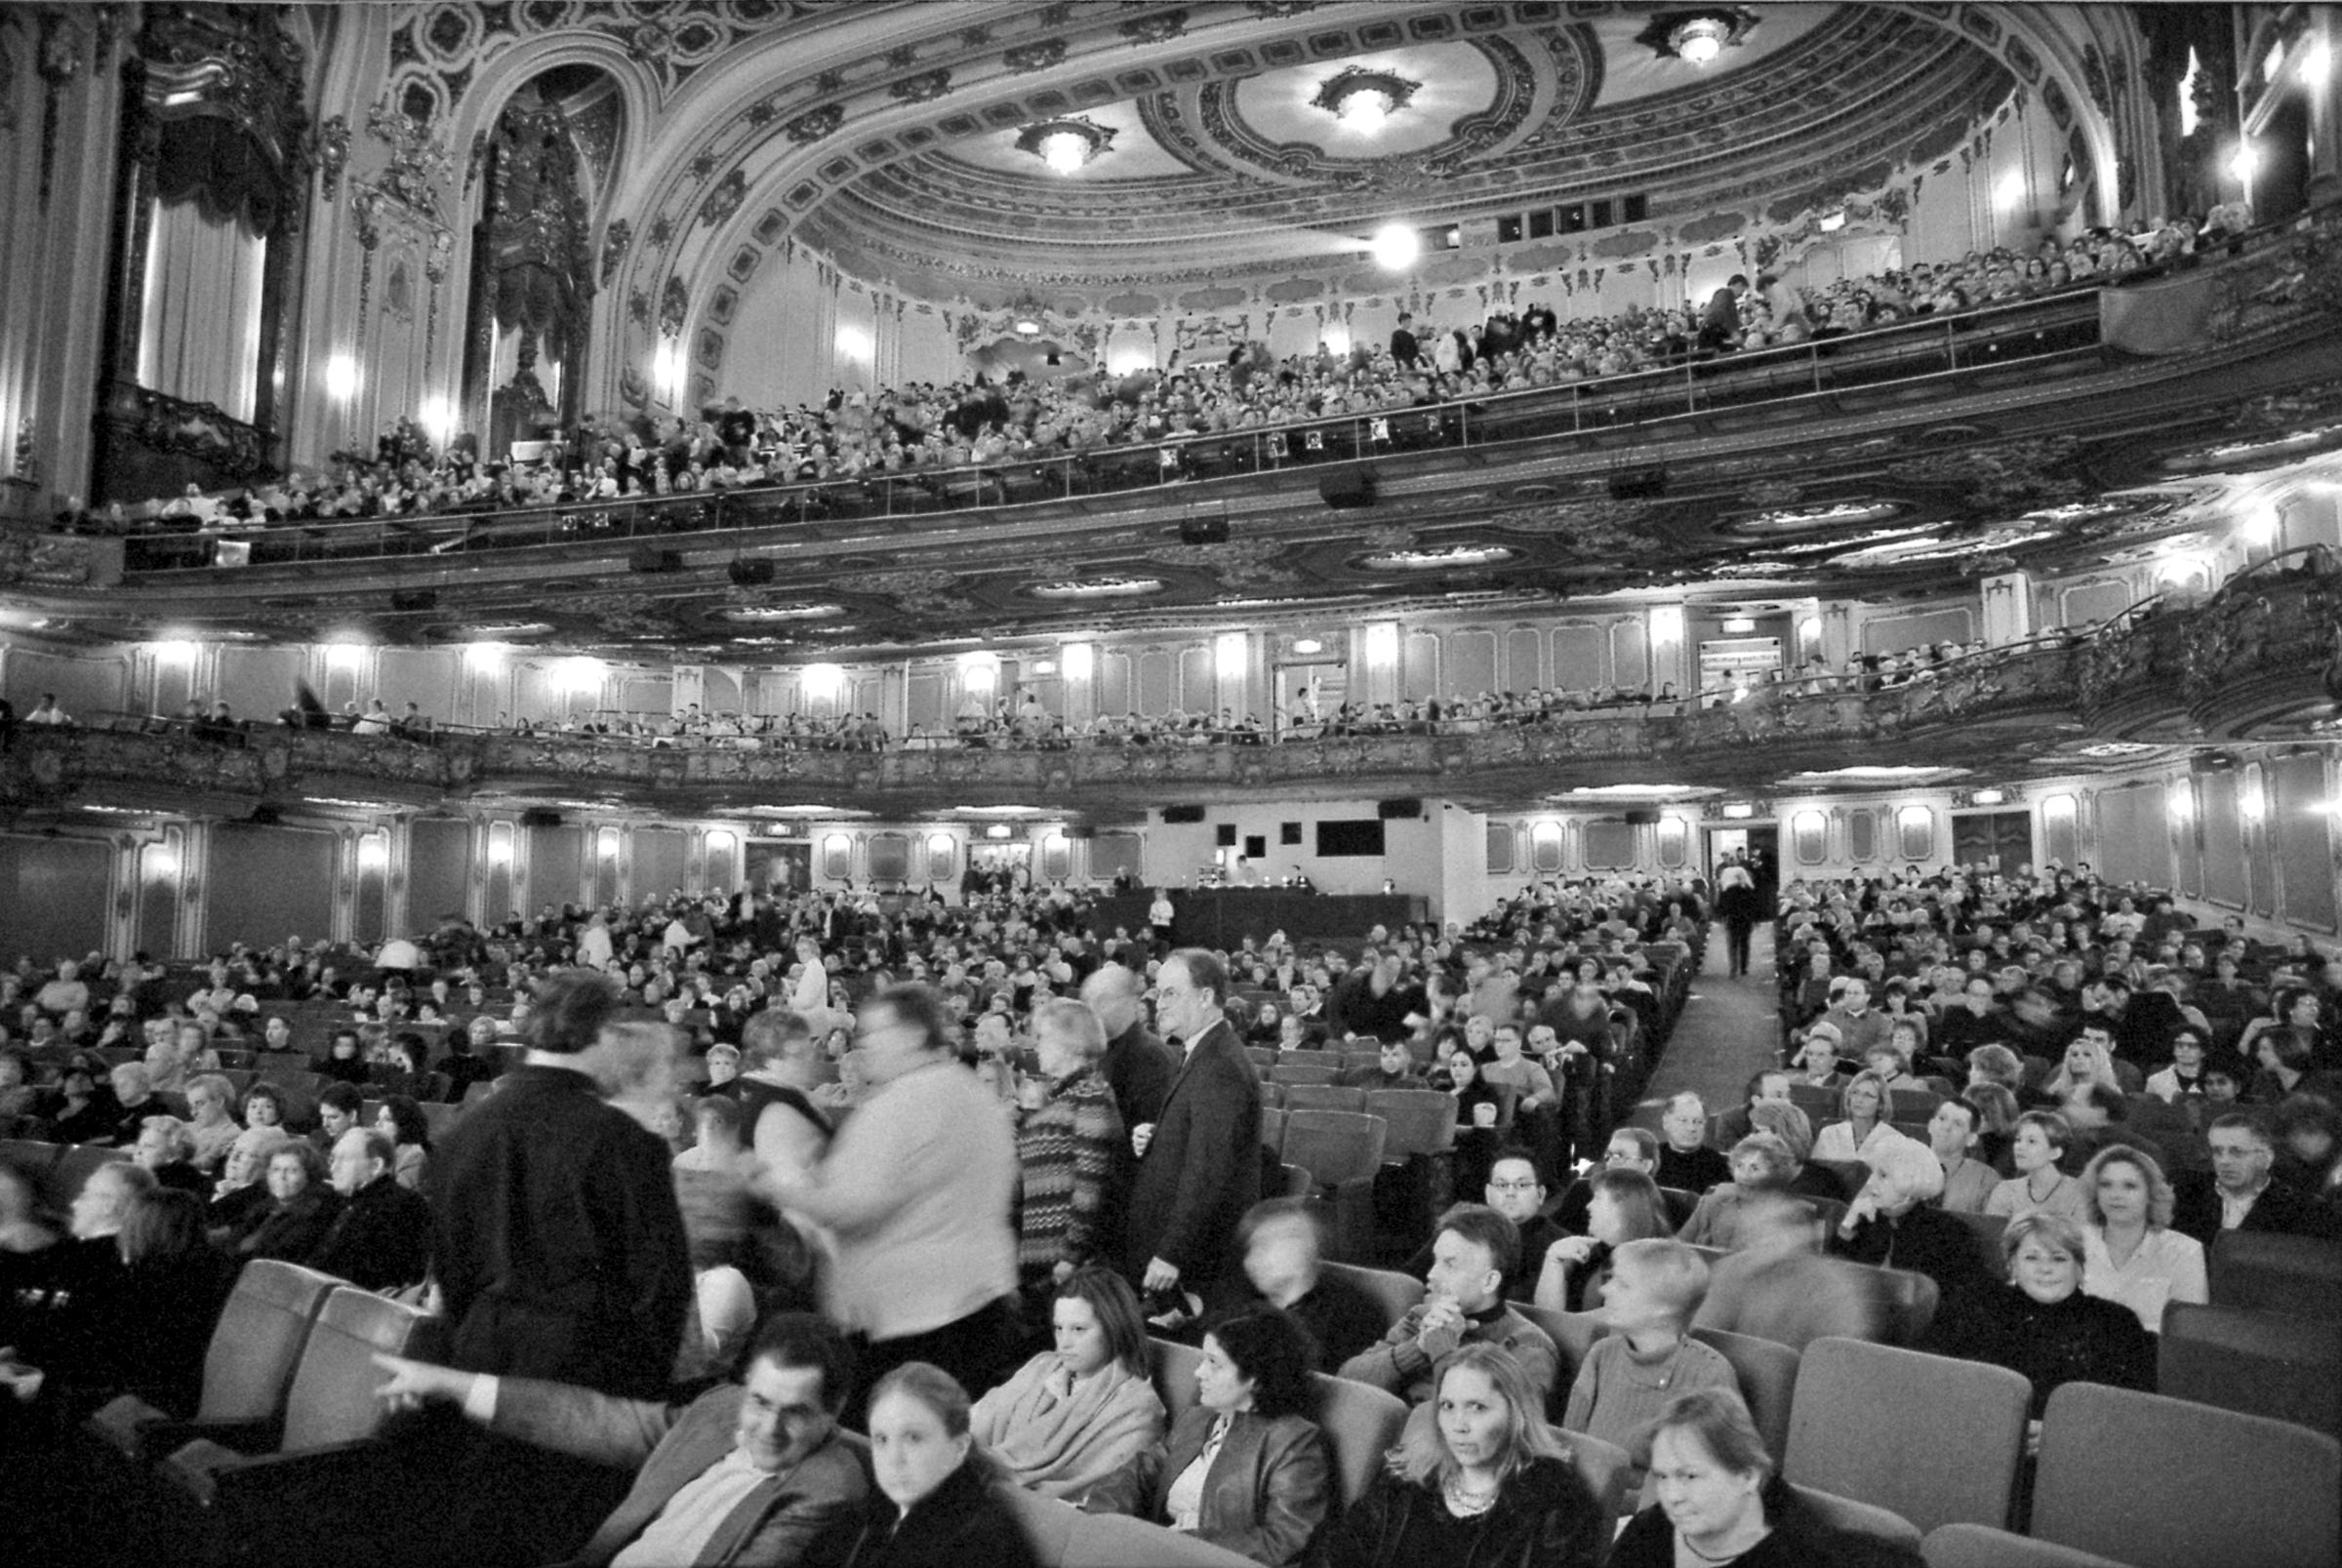 Midland Theater, St. Louis MO